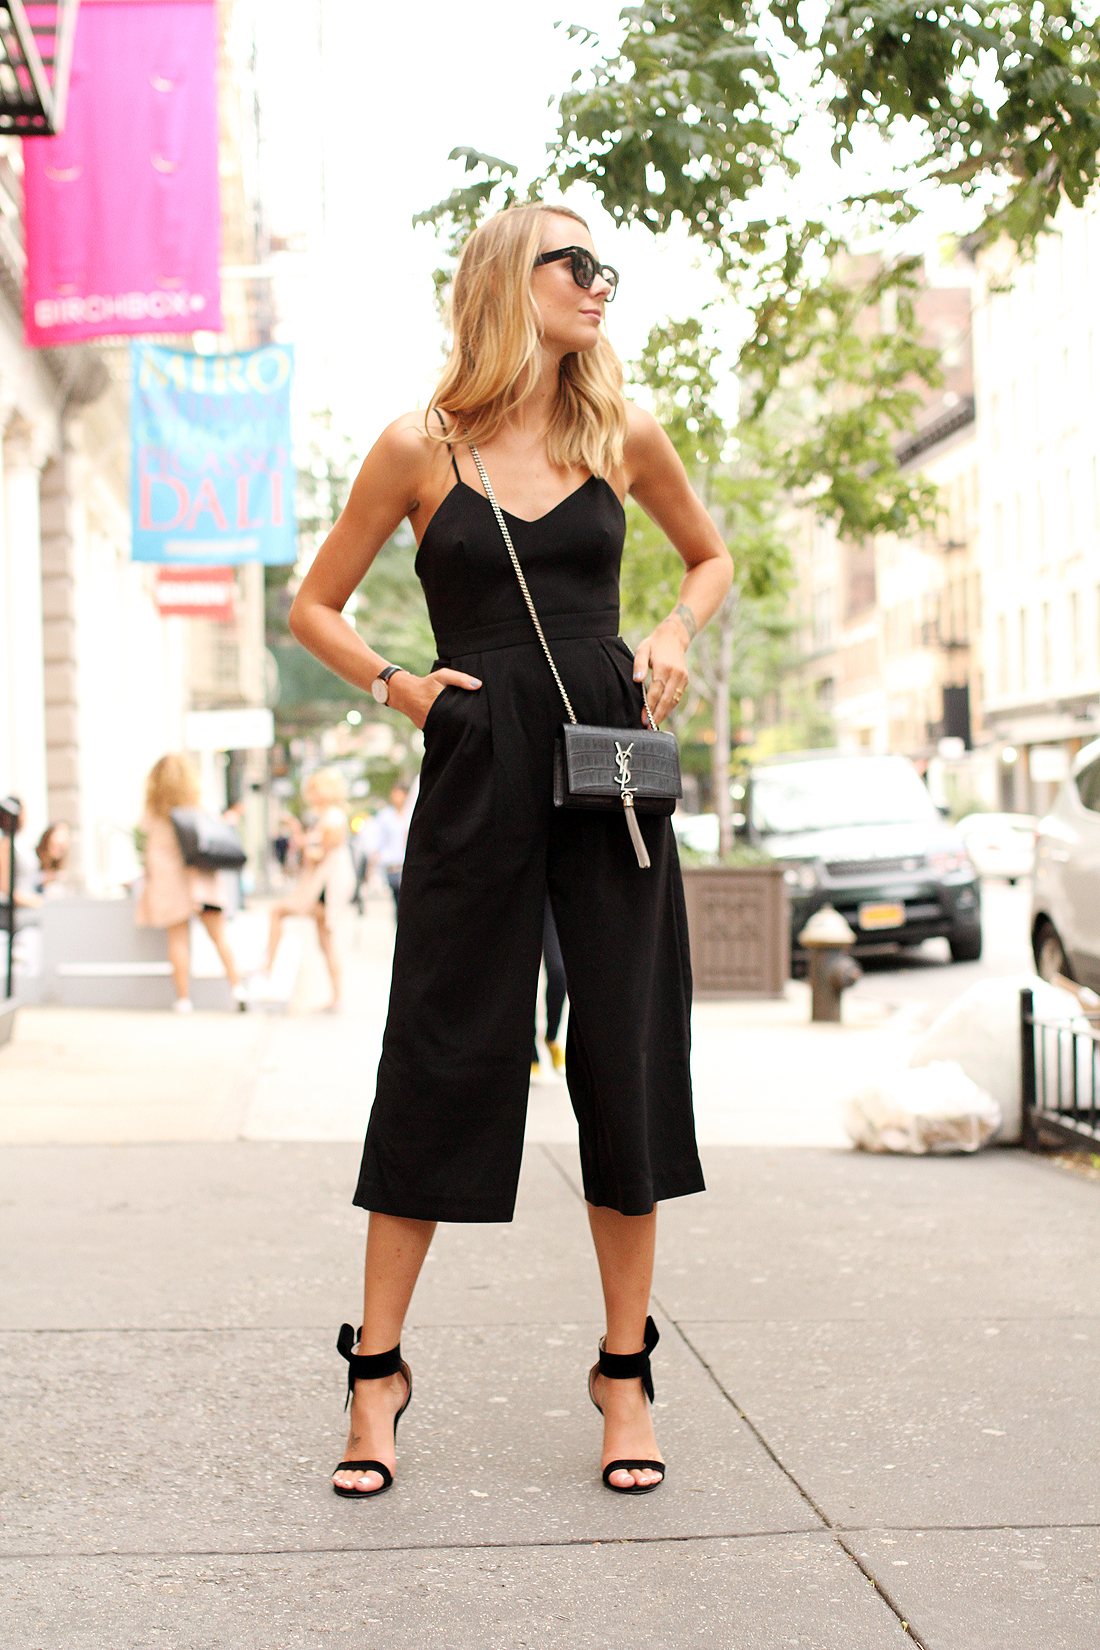 fashion-jackson-cameo-power-trip-jumpsuit-saint-laurent-cassandre-crossbody-handbag-black-bow-heels-street-style-nyfw